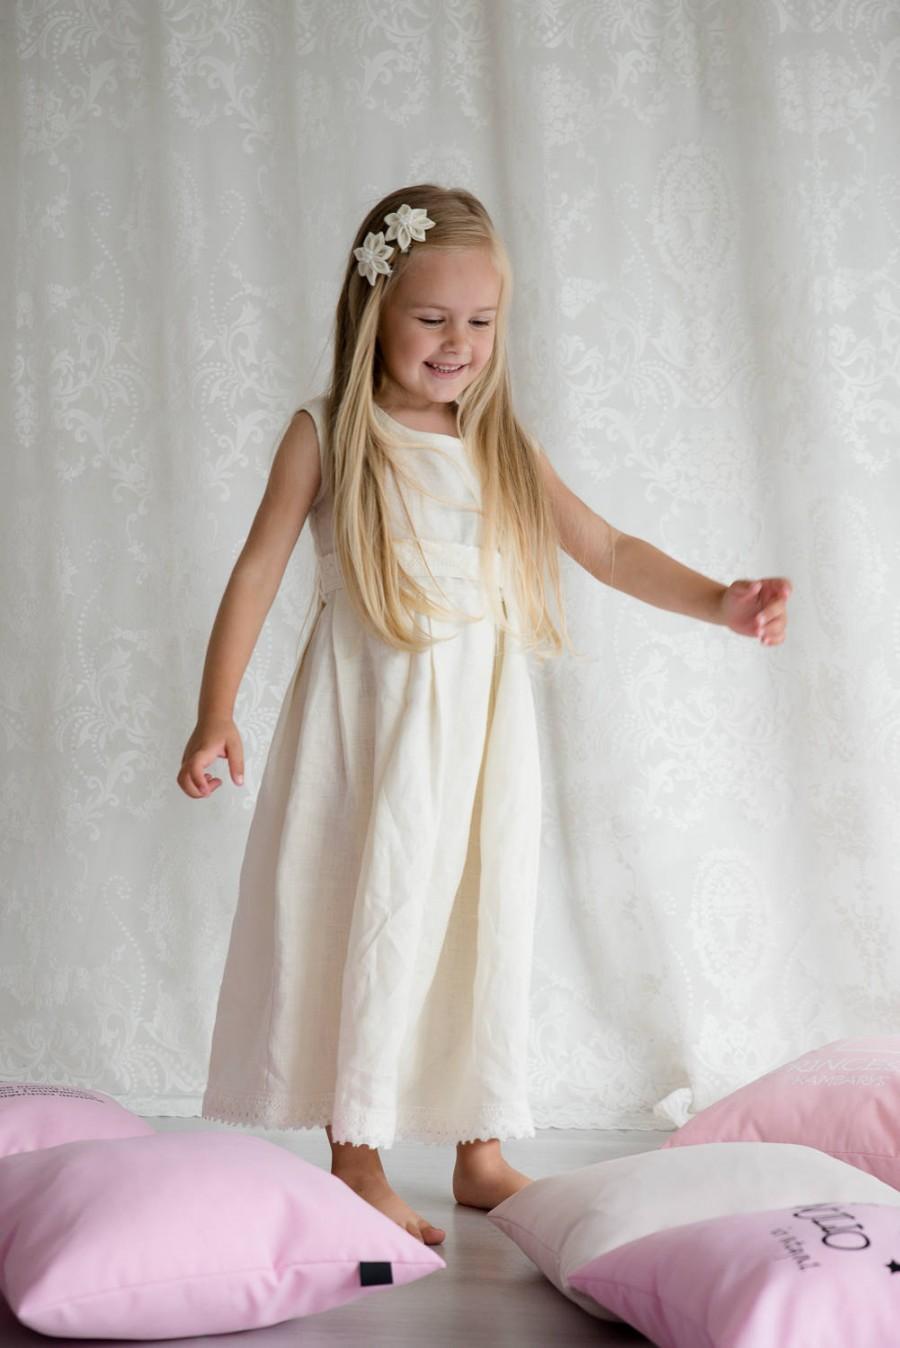 Wedding - Ivory girls linen dress, Christening dress, Ivory flower girl dress, Rustic wedding flower girl outfit, Toddler linen dress, Champagne dress